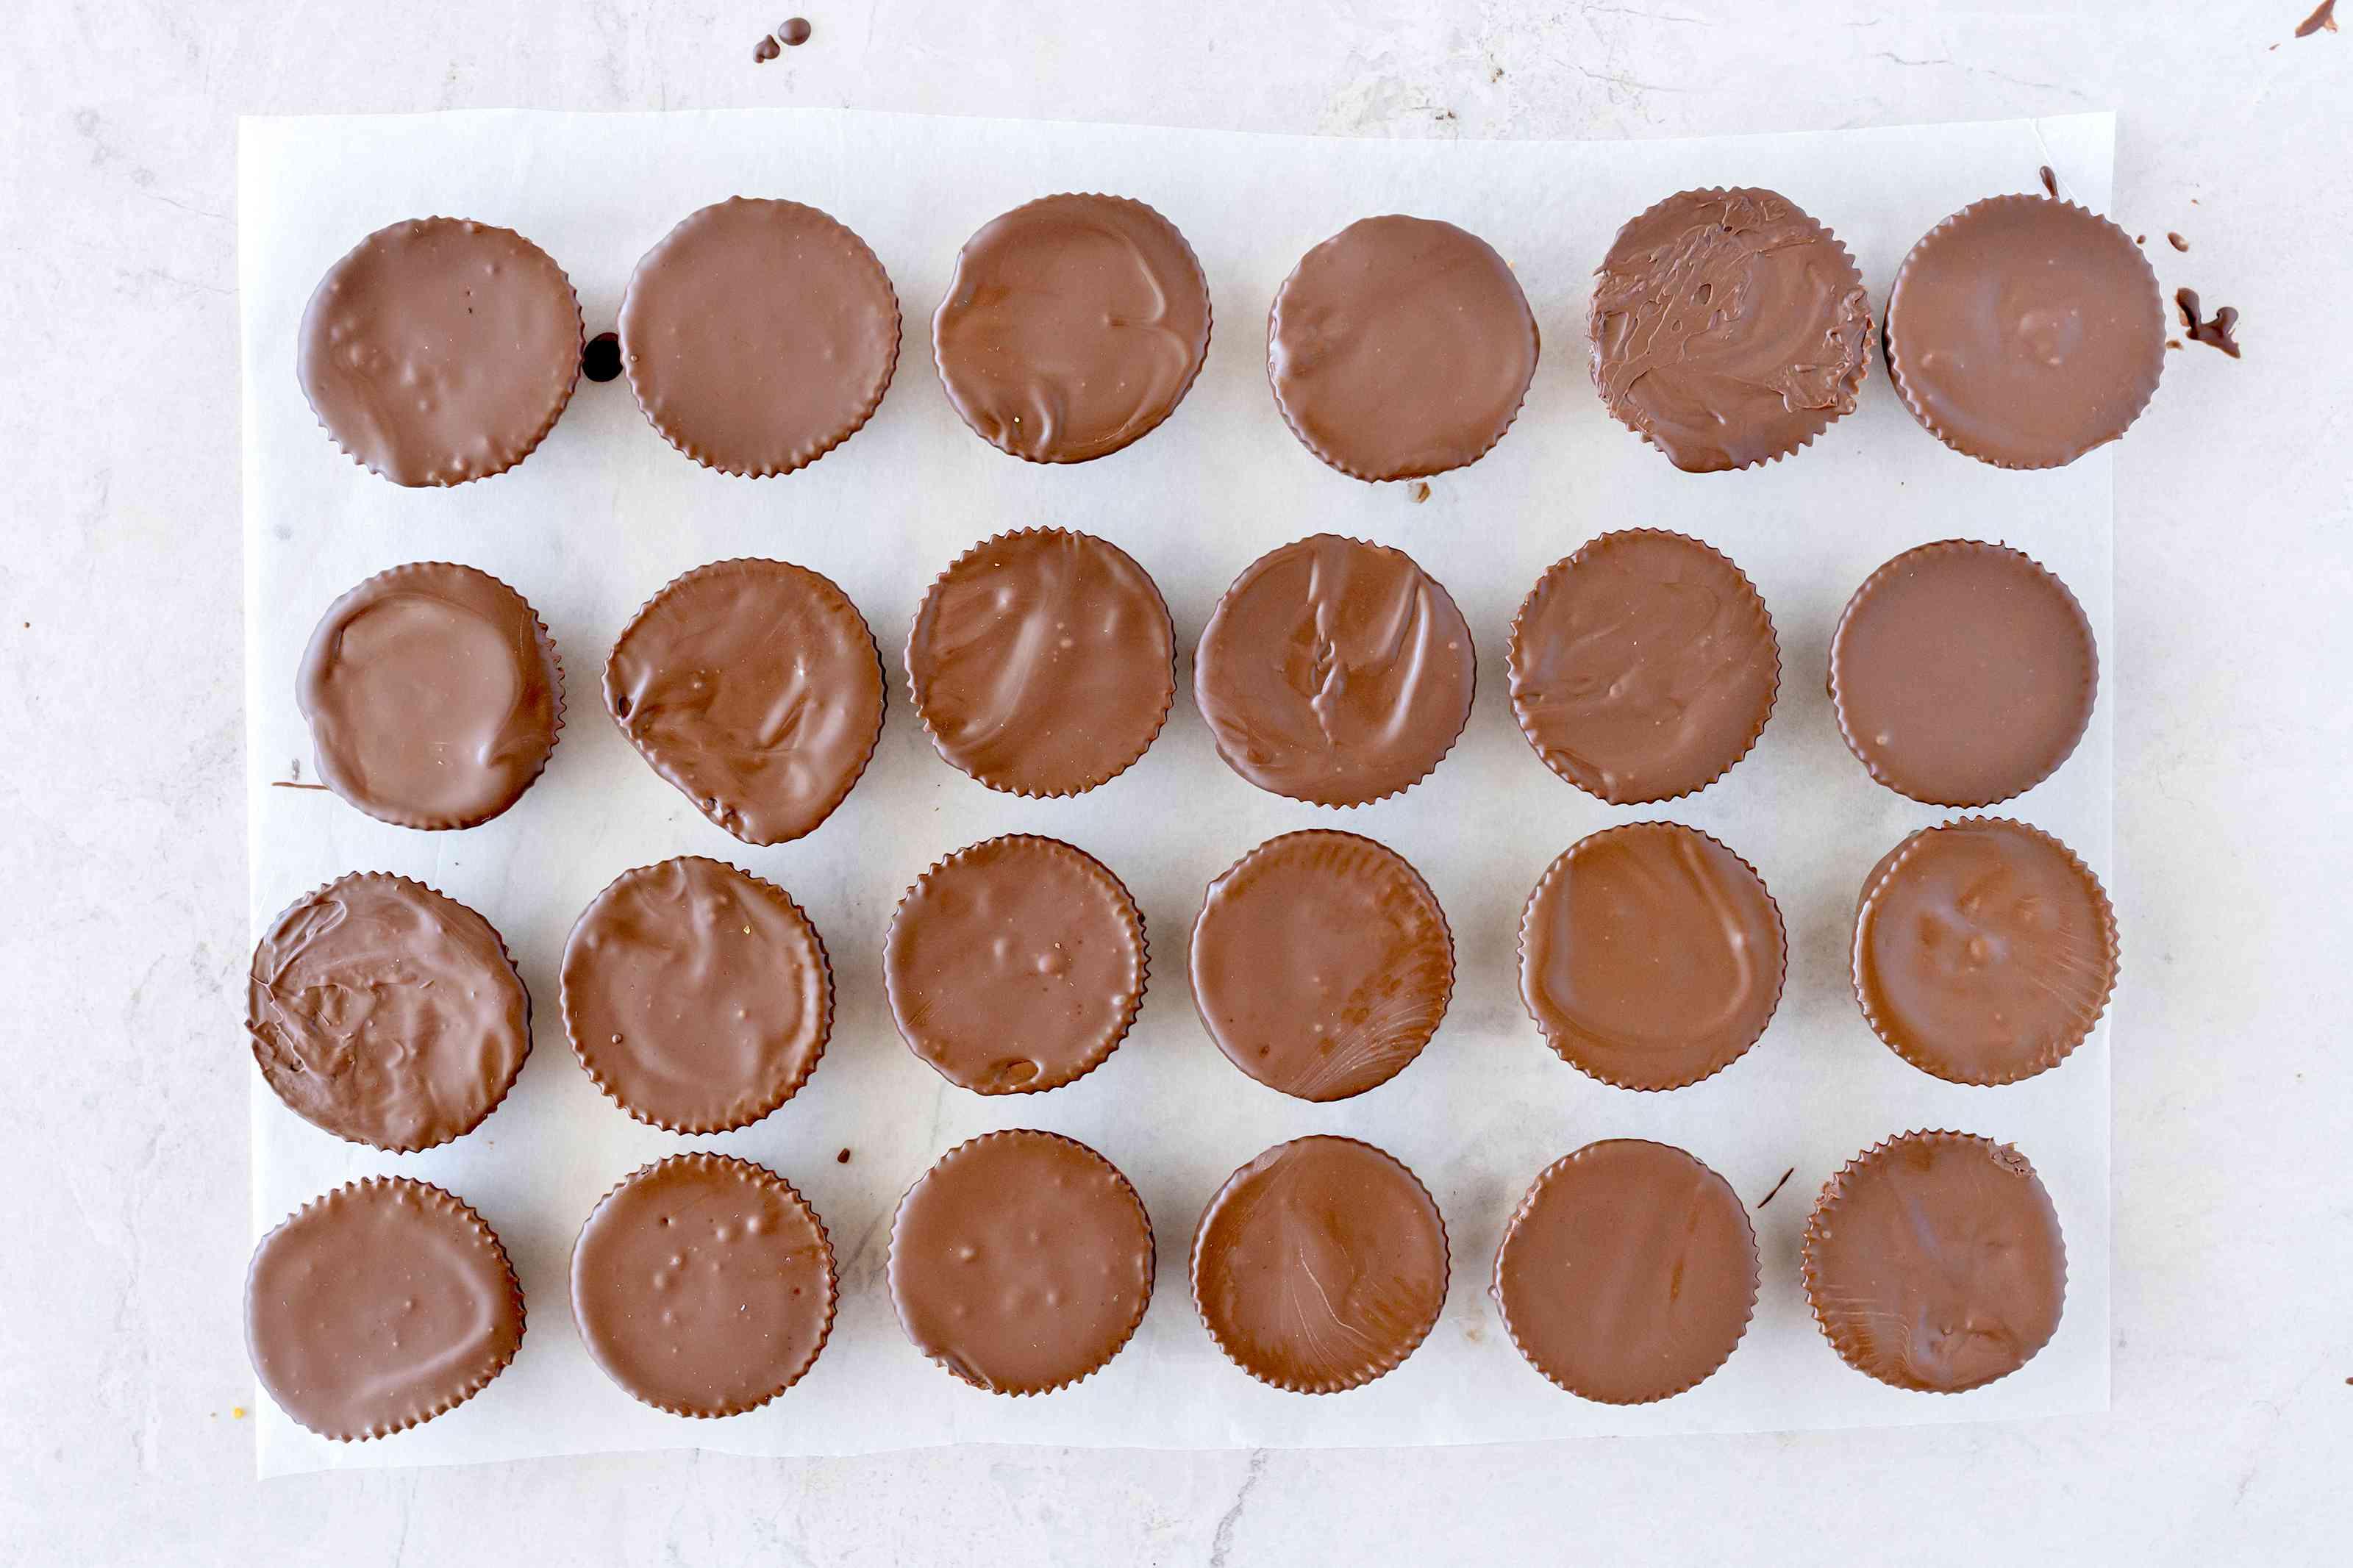 Chocolate coating